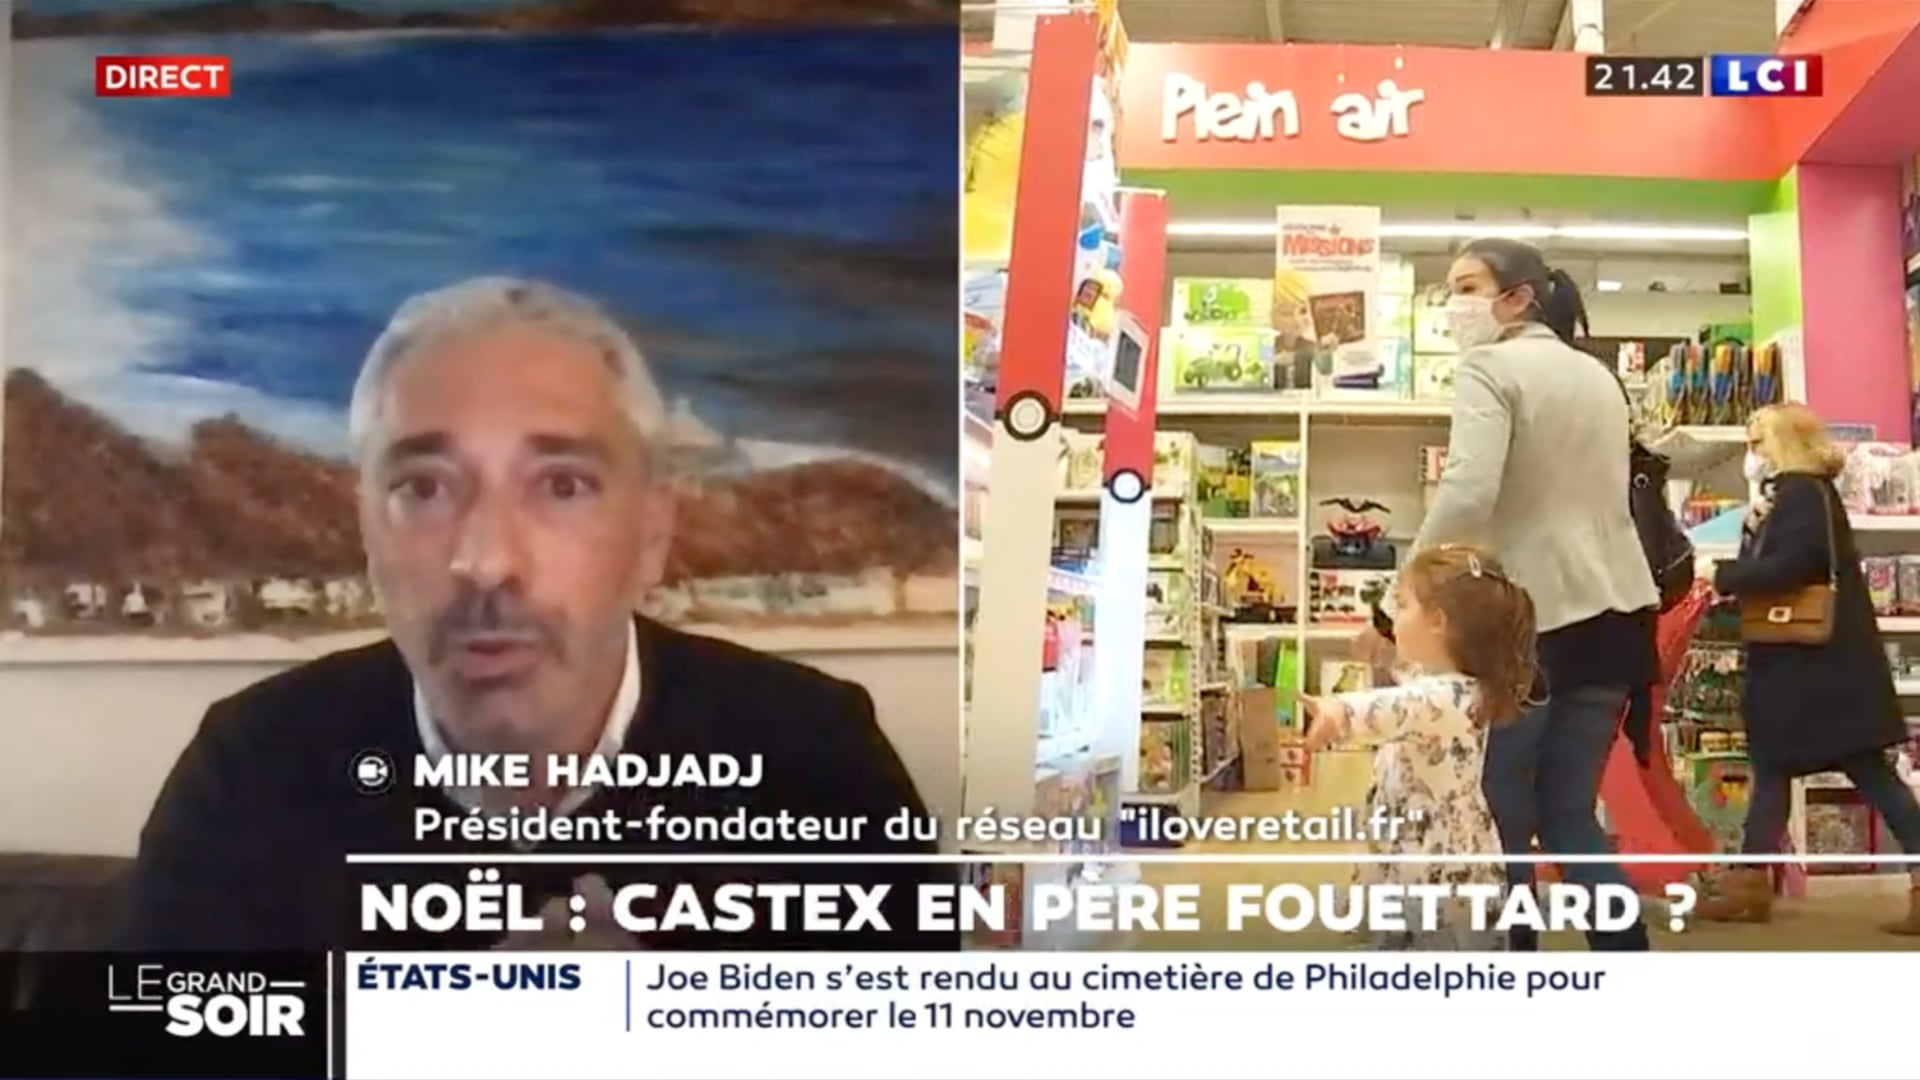 Noël : Castex en Père Fouettard ?